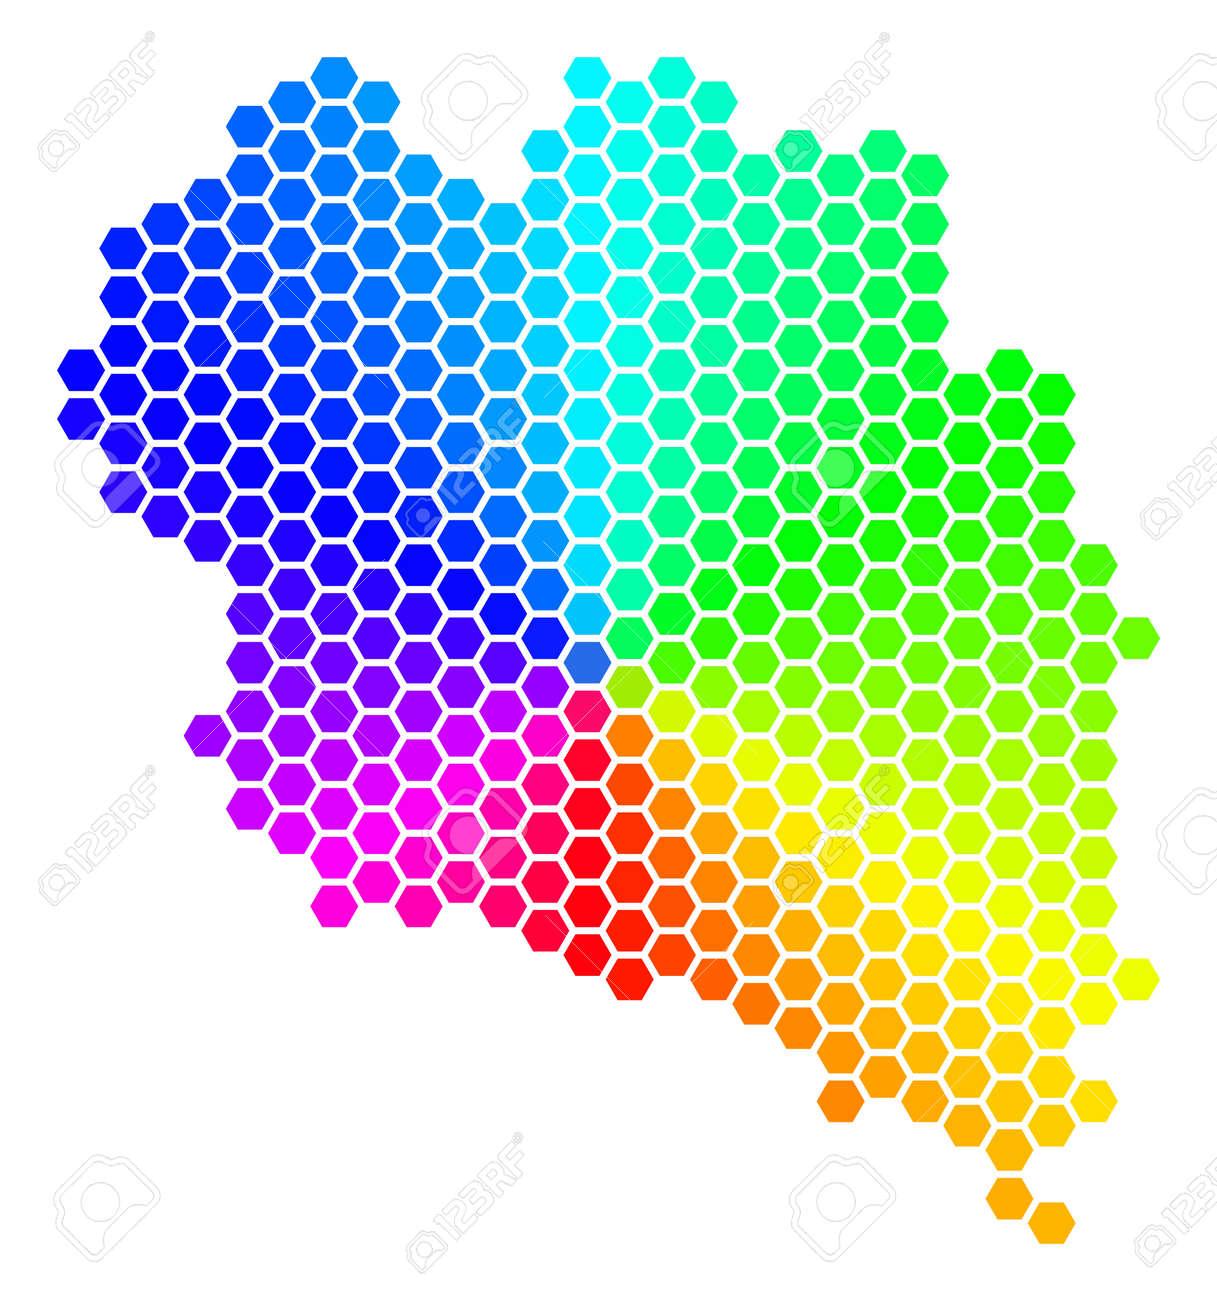 Koh Phangan Thailand Map.Spectrum Hexagon Koh Phangan Thai Island Map Vector Geographic